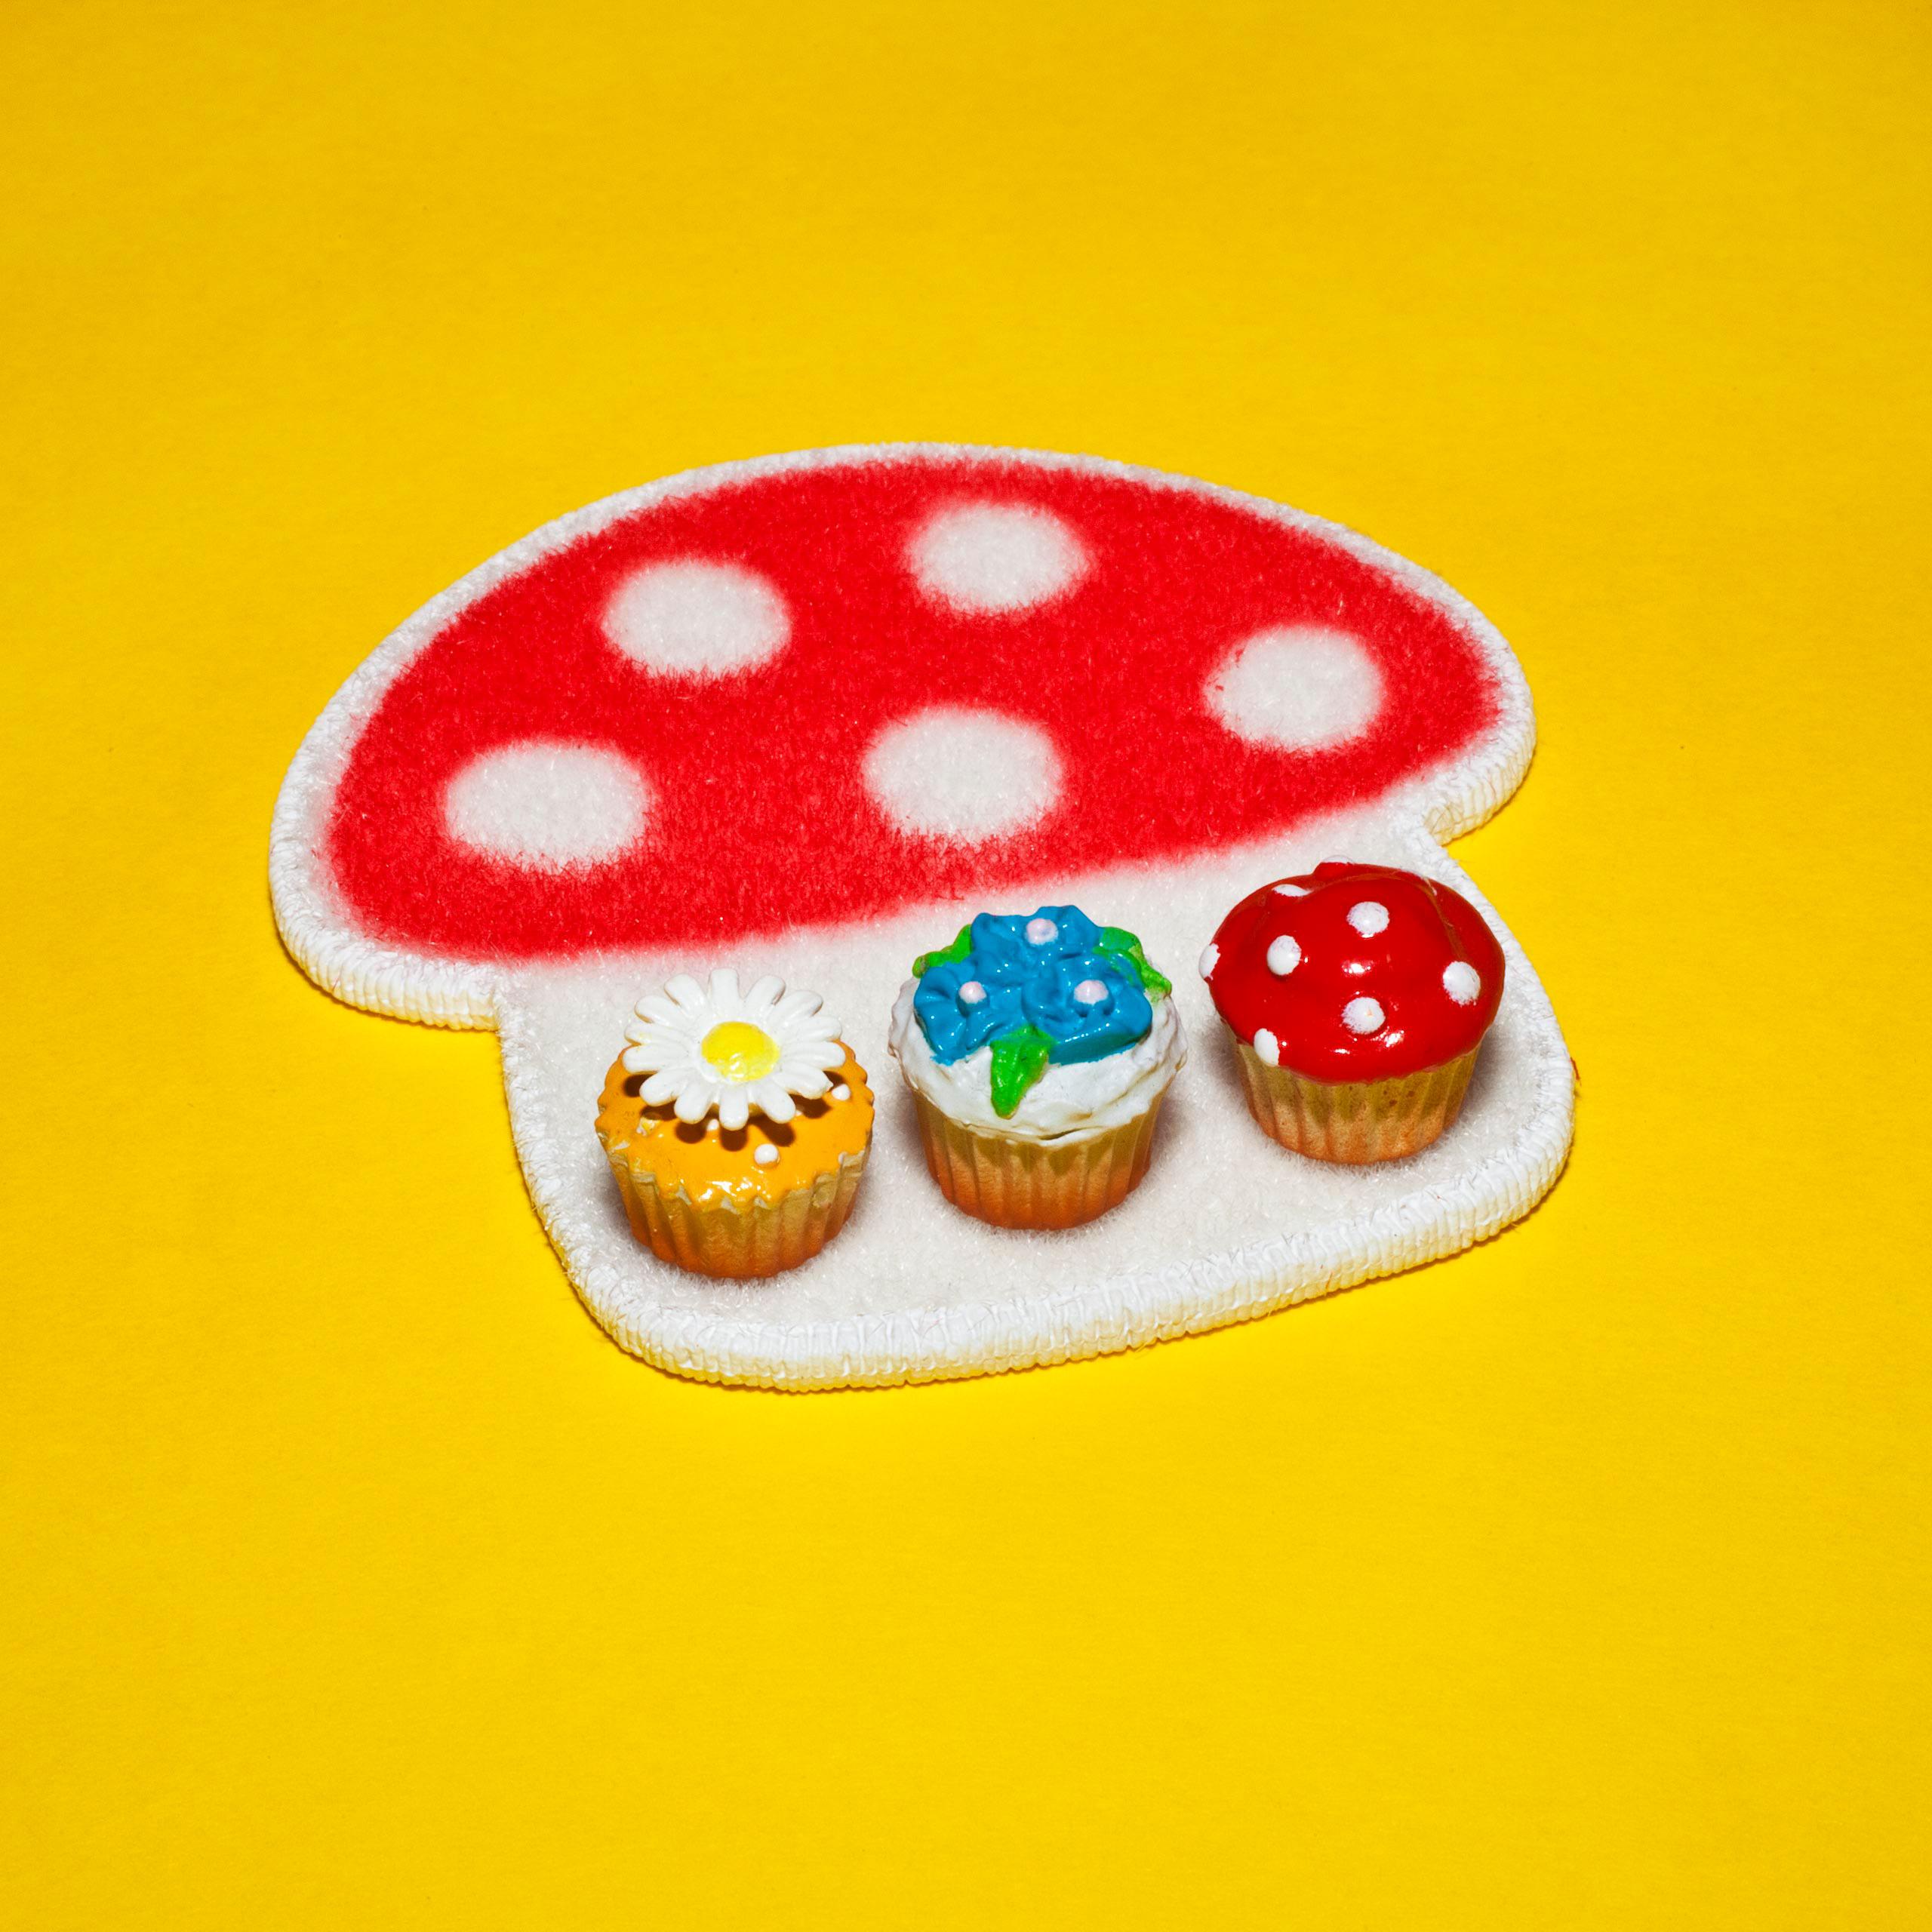 #flowerpower #polkadots #mushroom #thingsarequeer